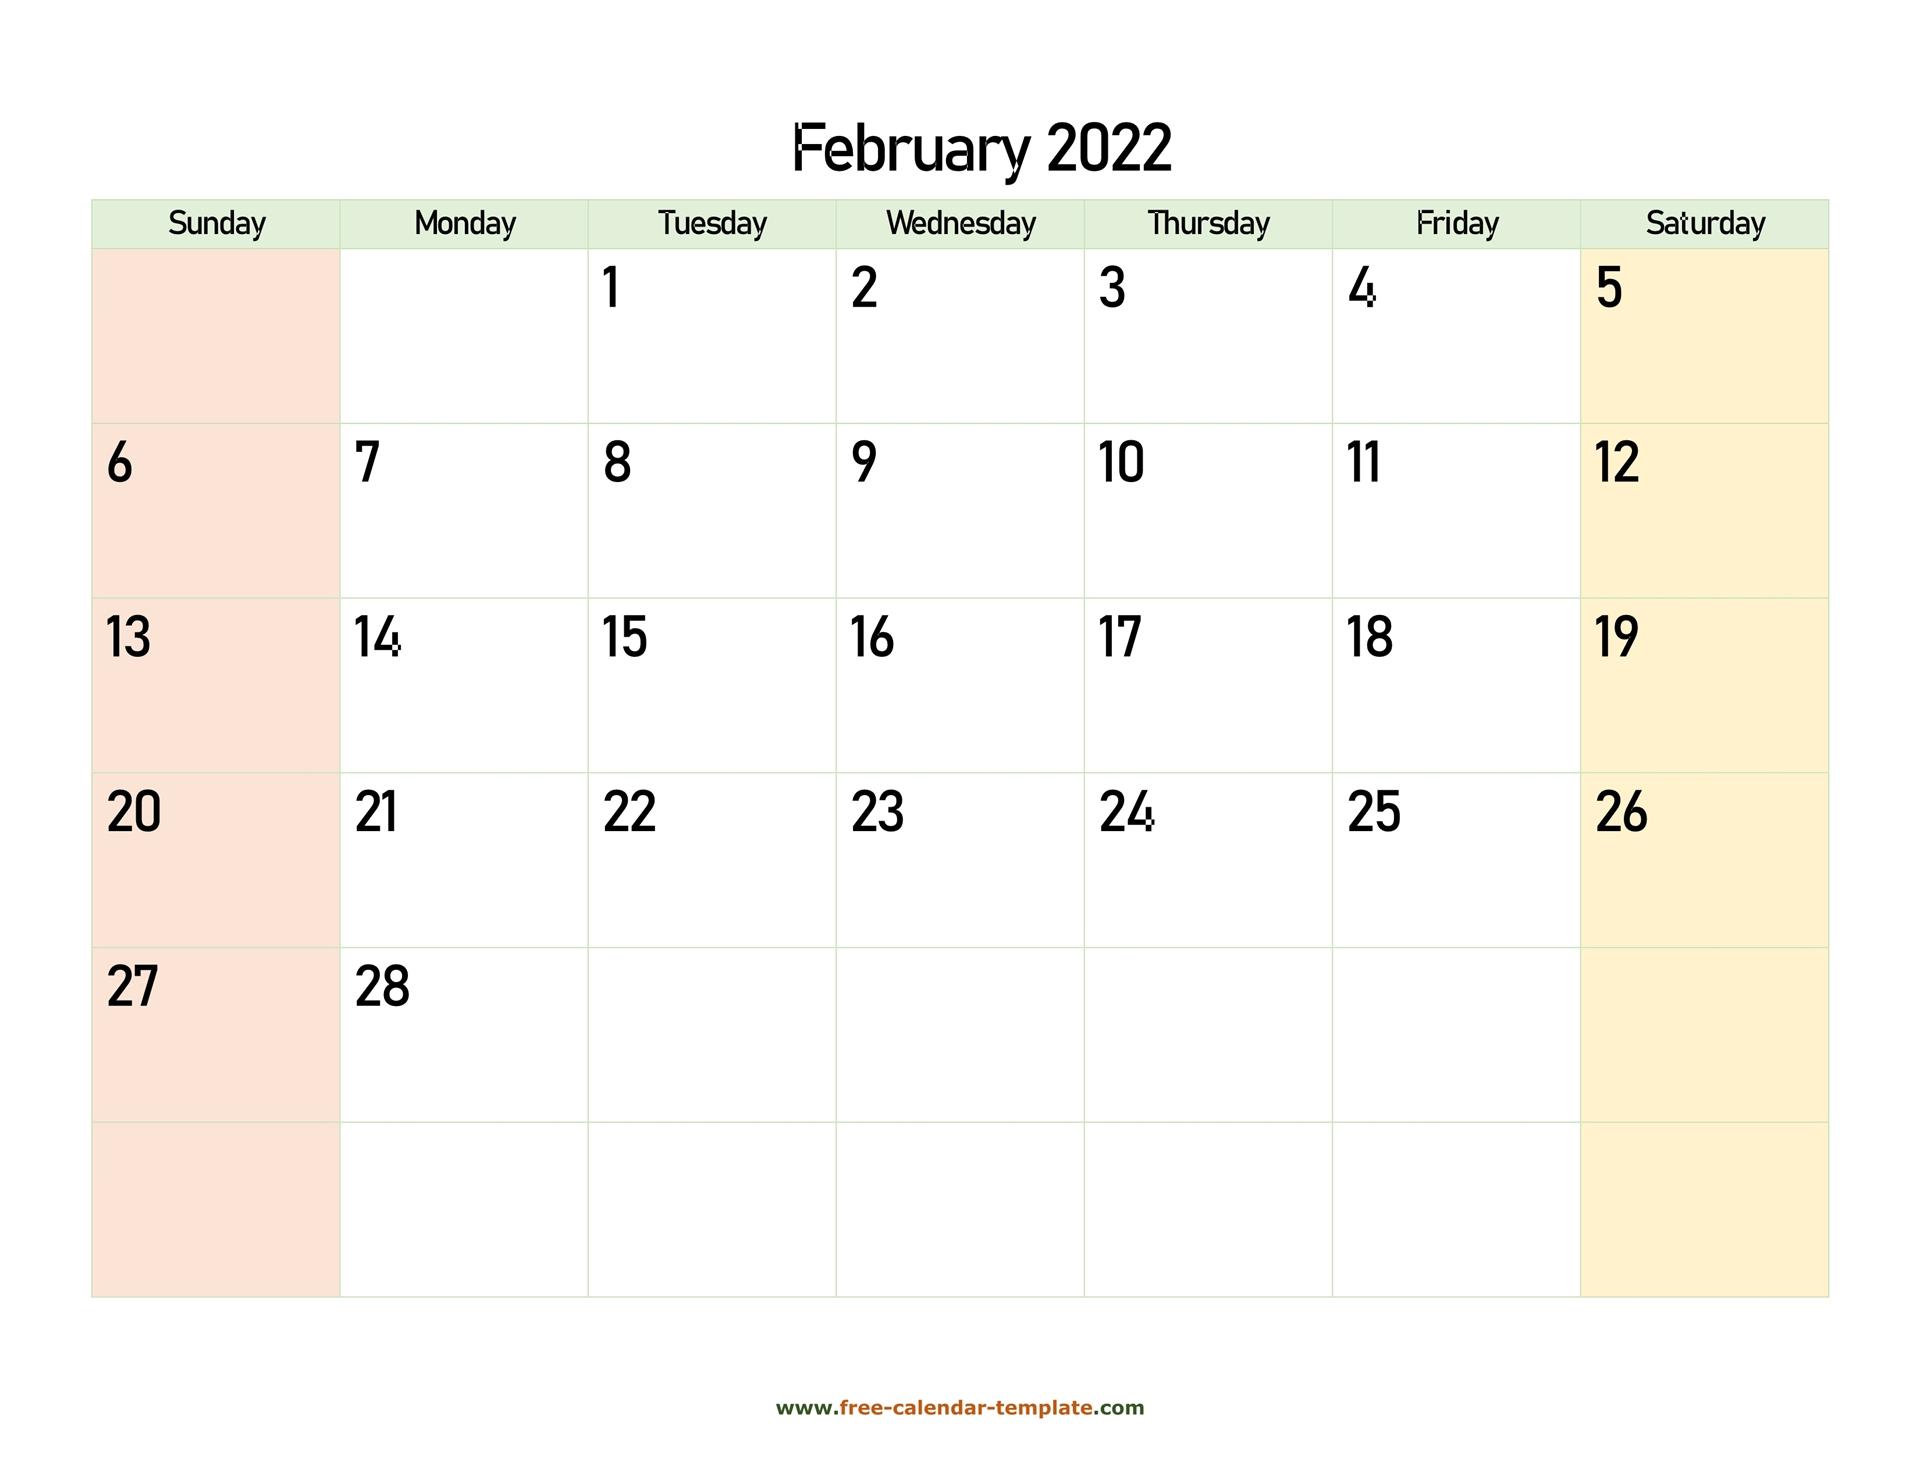 February 2022 Free Calendar Tempplate   Free Calendar Inside 2022 Free Big Primt For Feb 2022